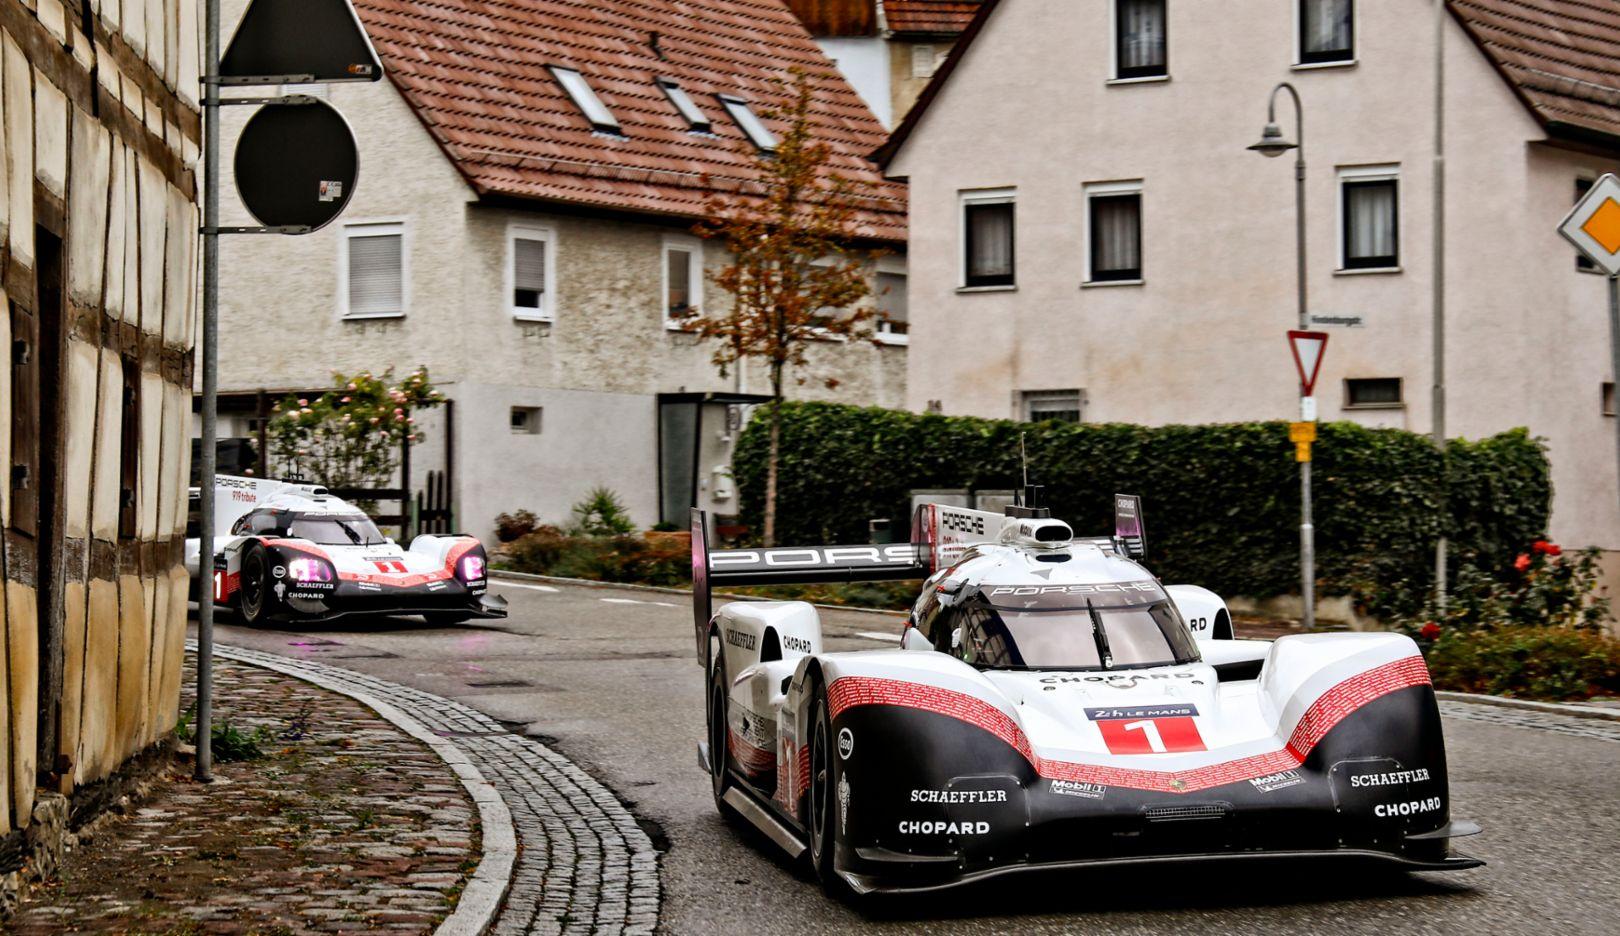 Porsche 919 Hybrid Evo (in front), Porsche 919 Hybrid, 2018, Porsche AG